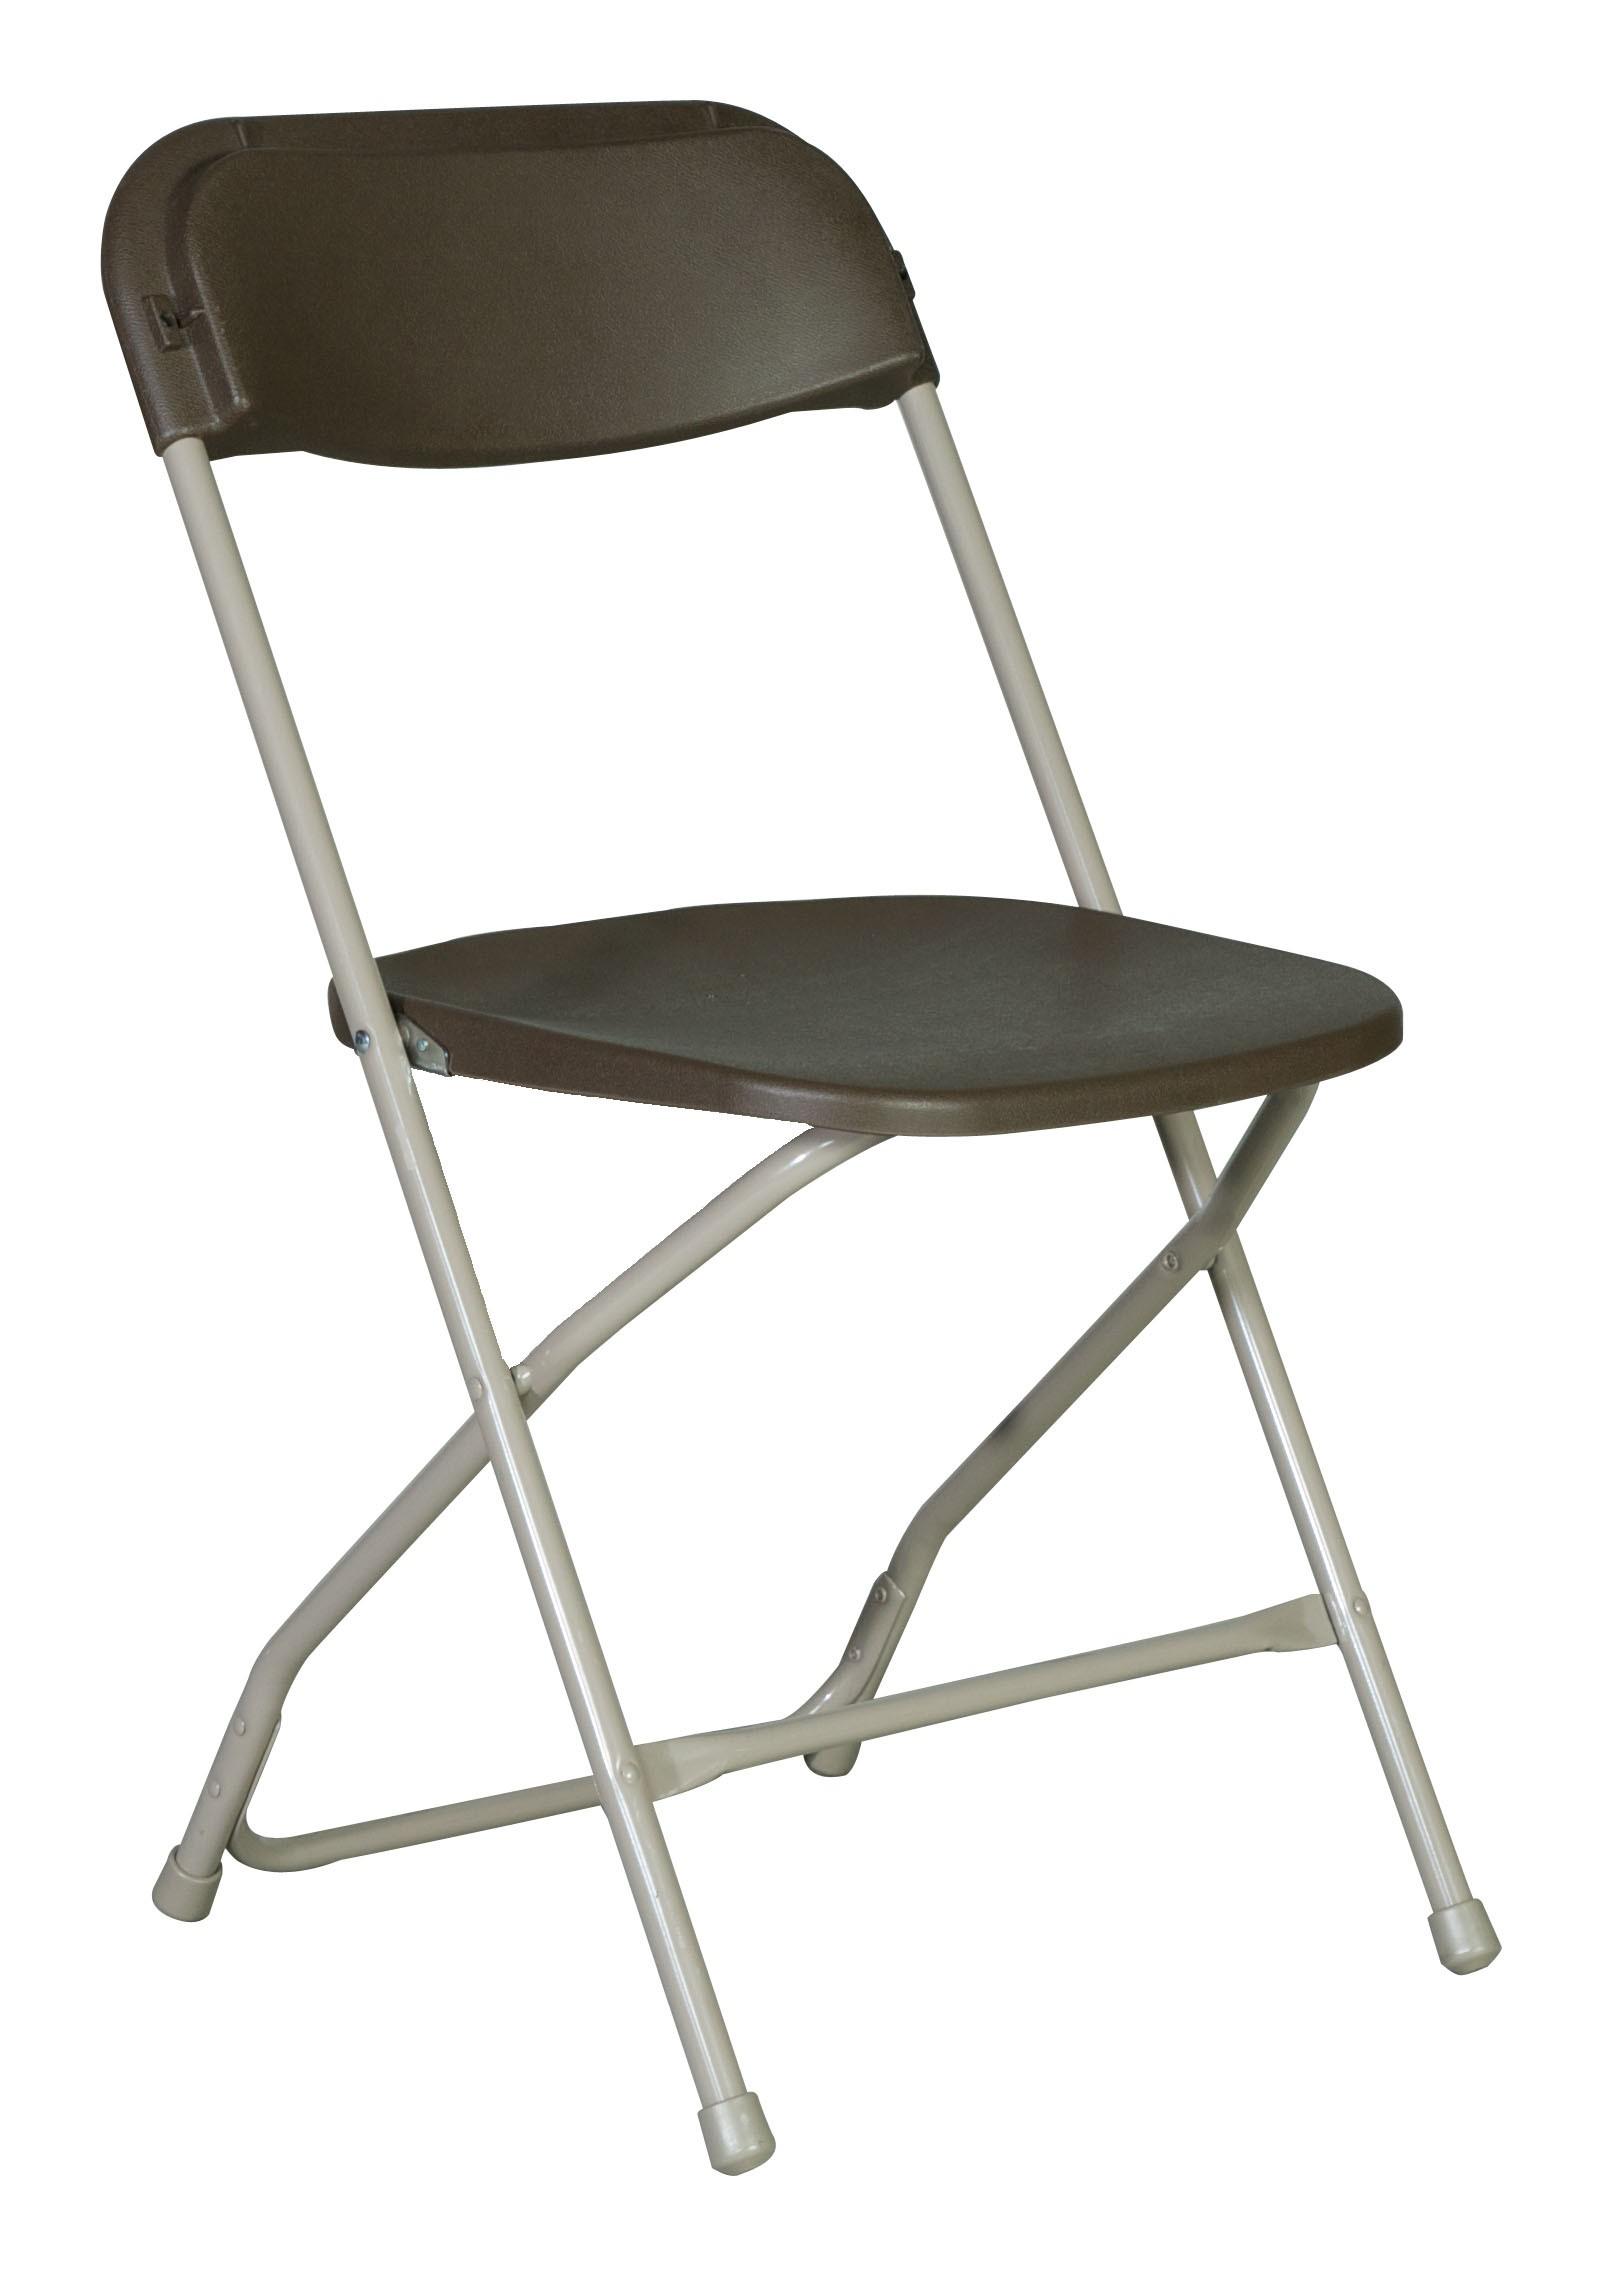 renting folding chairs extra large adirondack plastic reid rental newberg